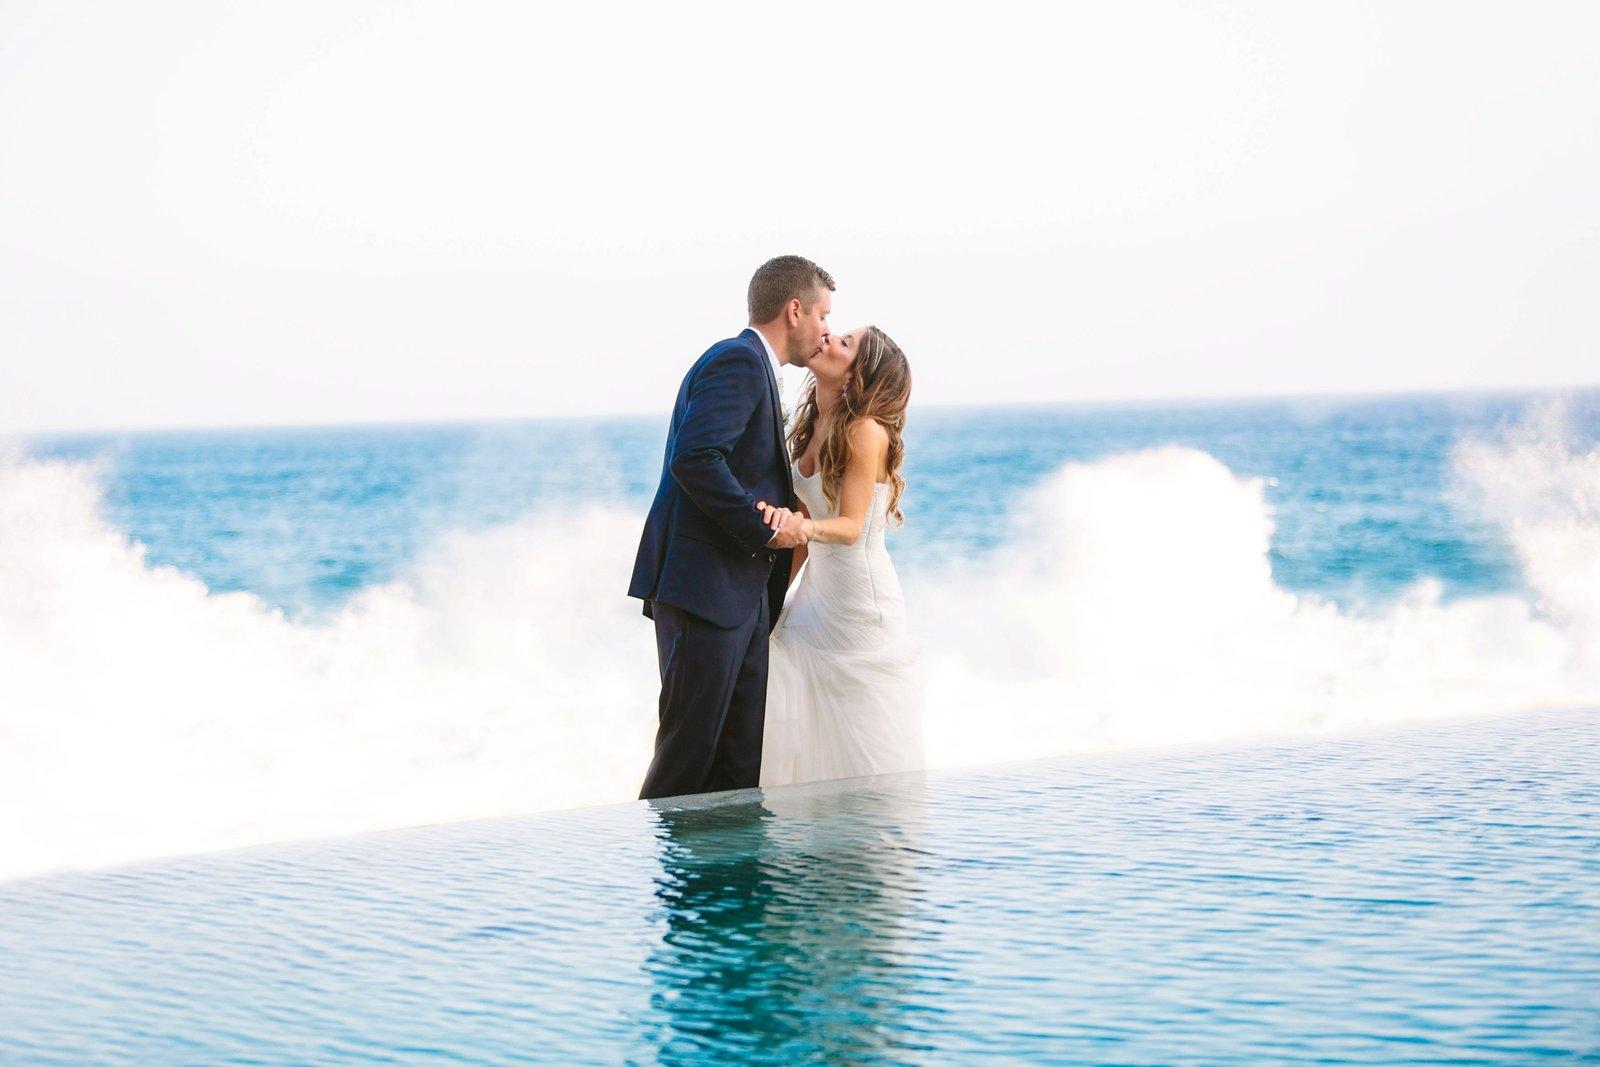 Wedding Photos-Jodee Debes Photography-429